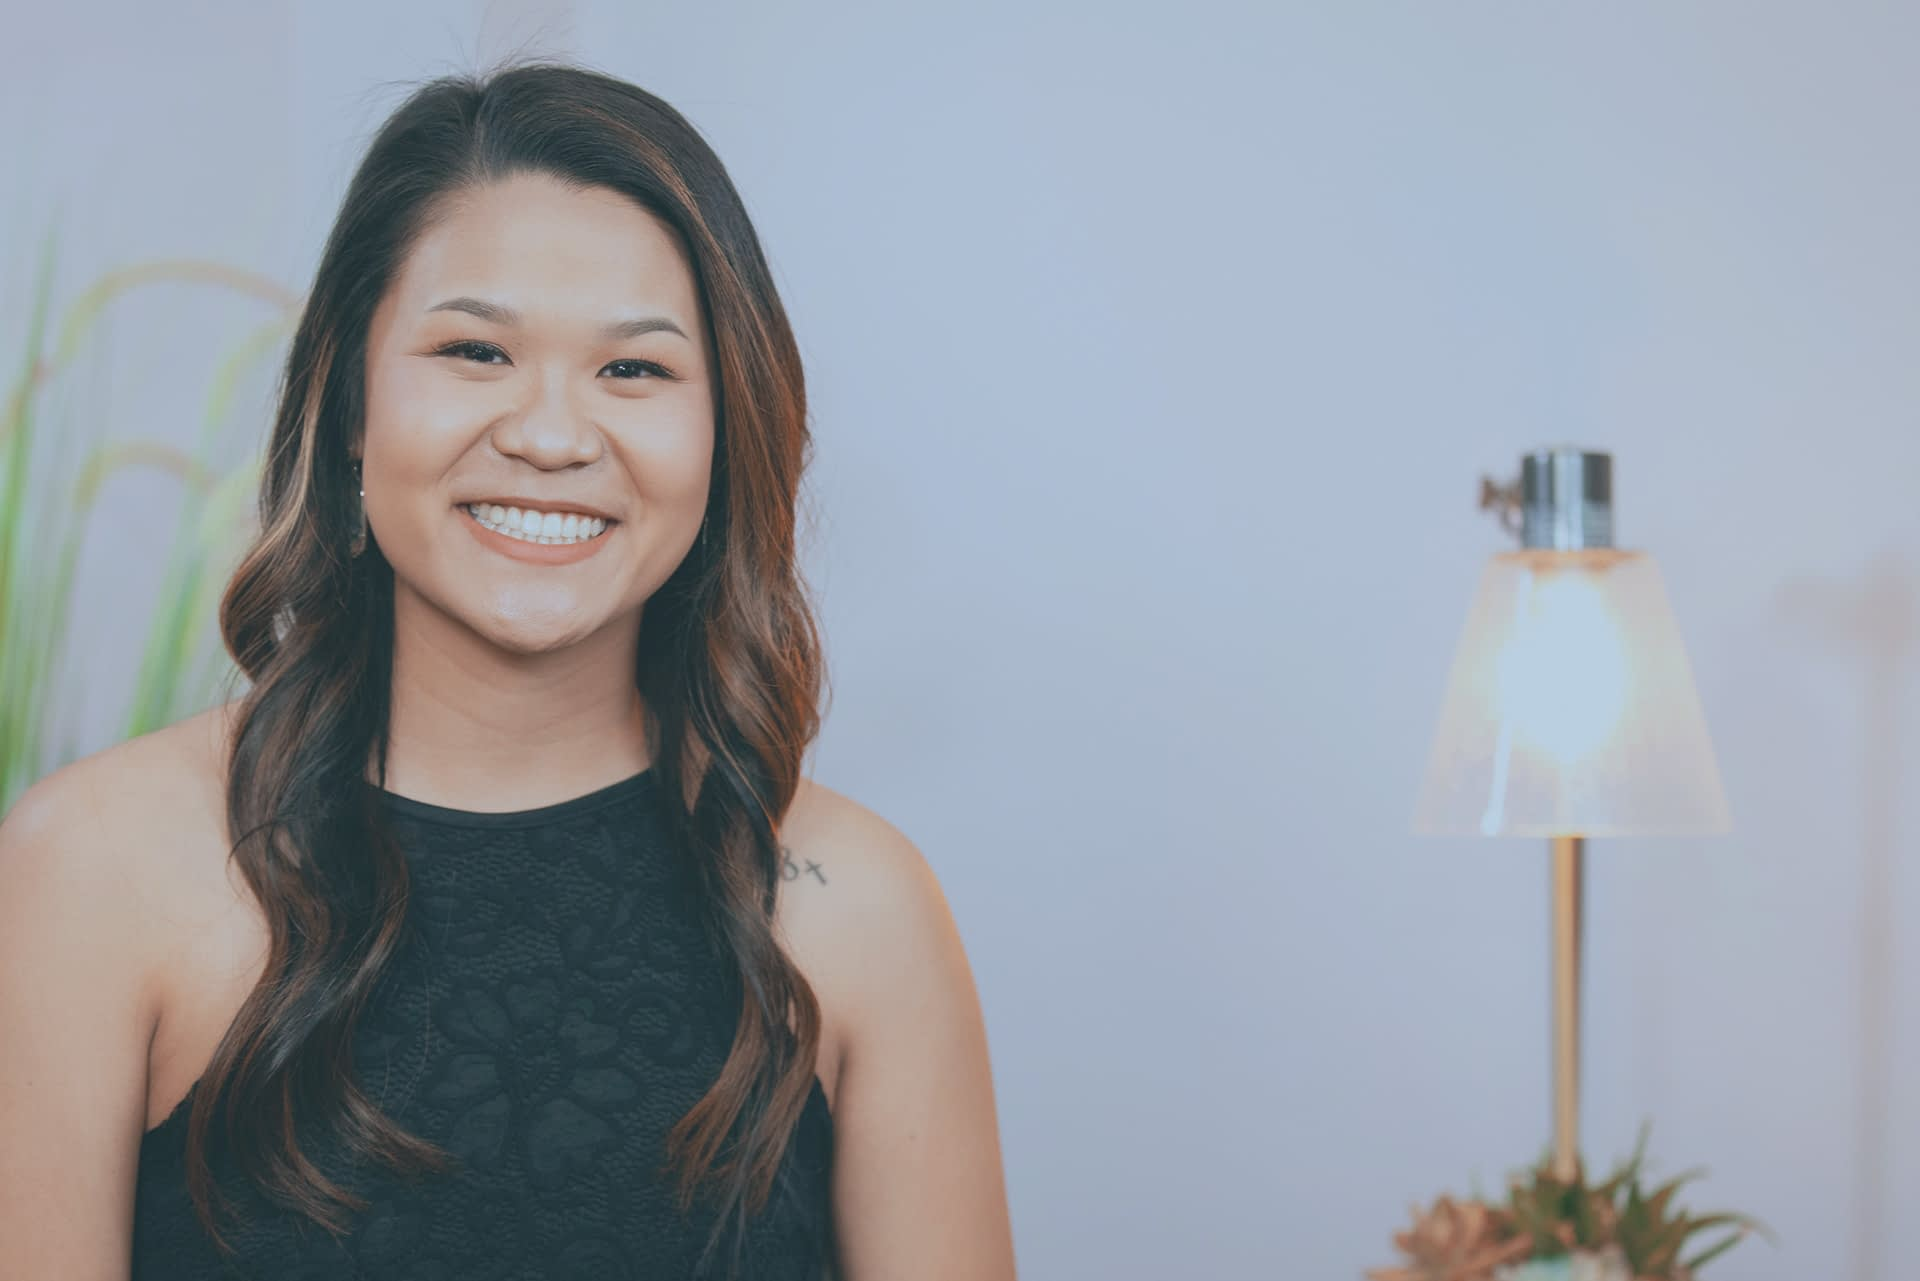 Katy Miser dental implant testimonial